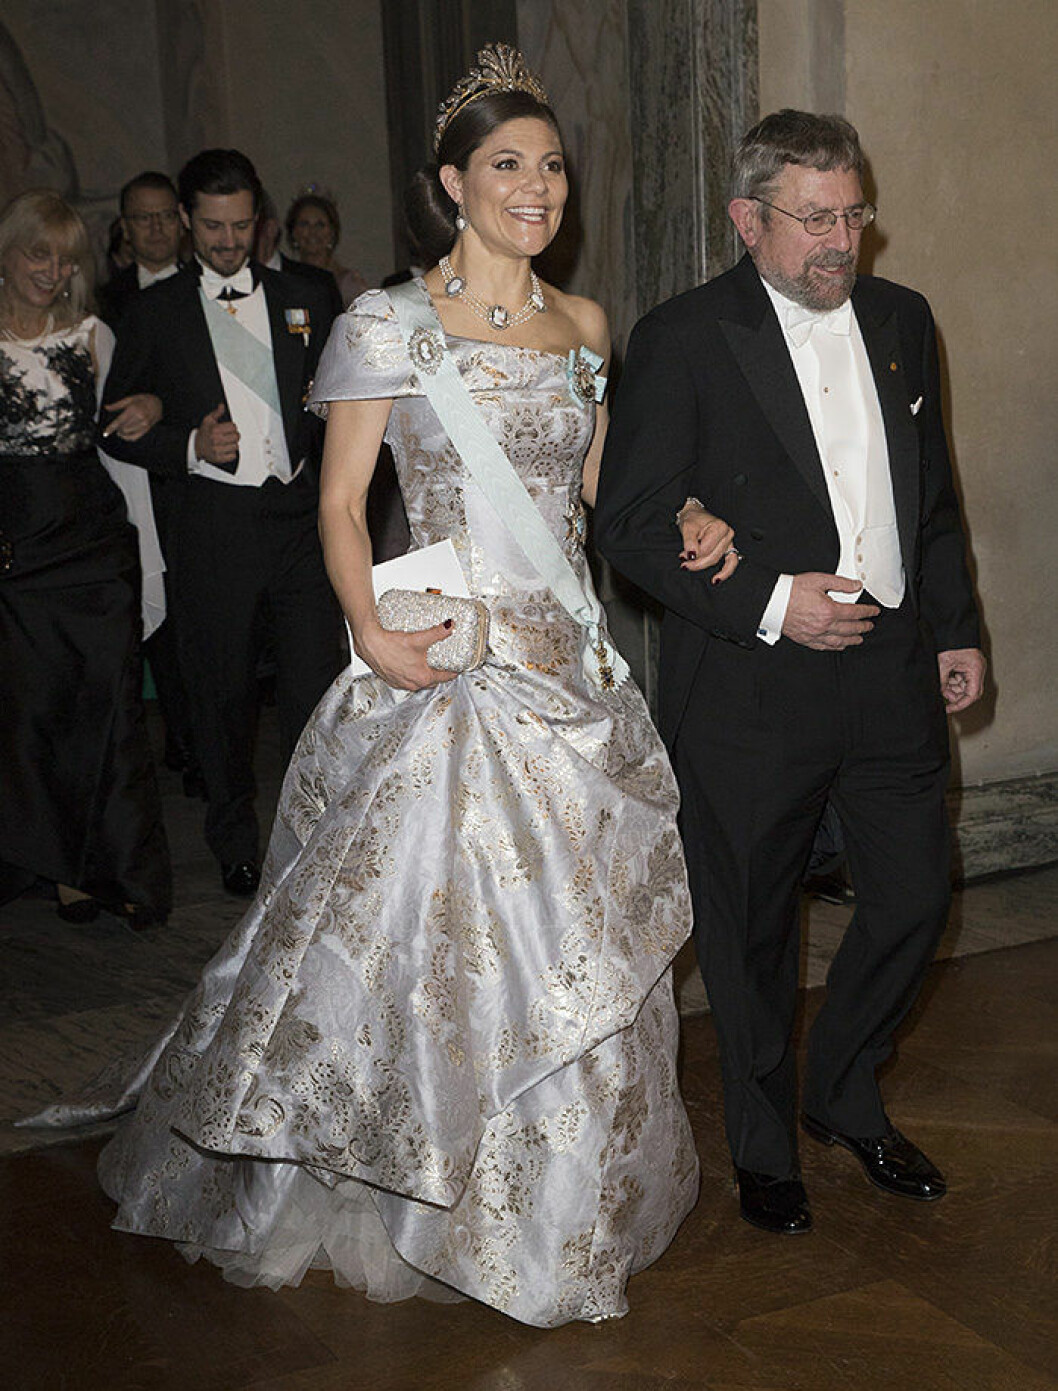 Crown princess Victoria, J. Michael Kosterlitz Nobel banquet, Stockholm City Hall, Stockholm 2016-12-10 (c) Charles Hammarsten / IBL Nobelbanketten, Stockholms Stadshus 2016-12-10